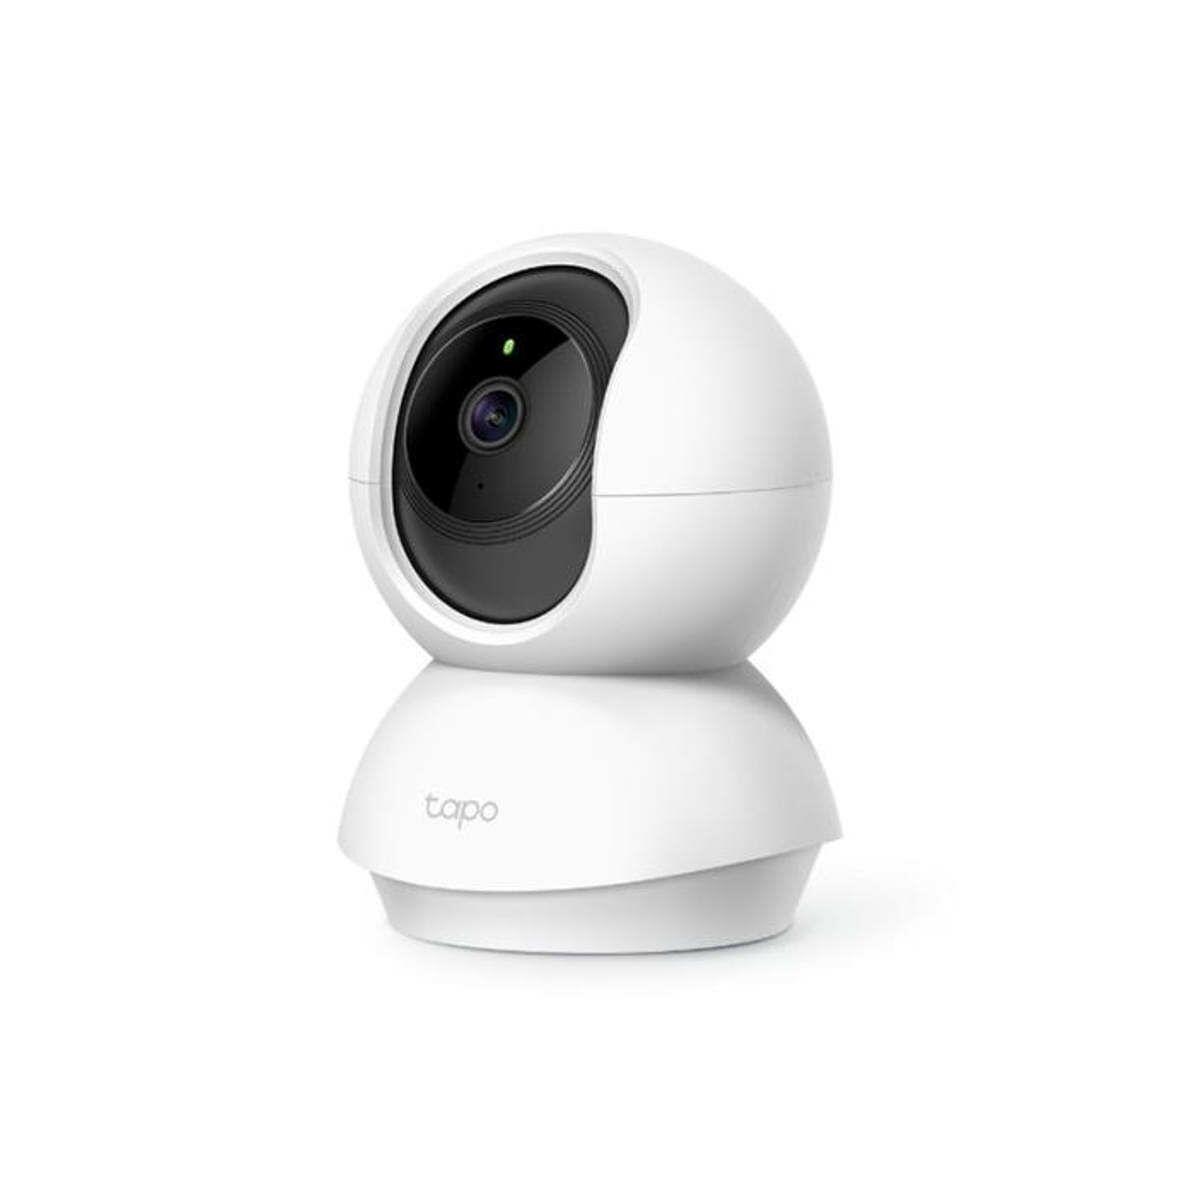 TP-Link Tapo C200 Security Camera 1080P biztonsági kamera, fehér EU